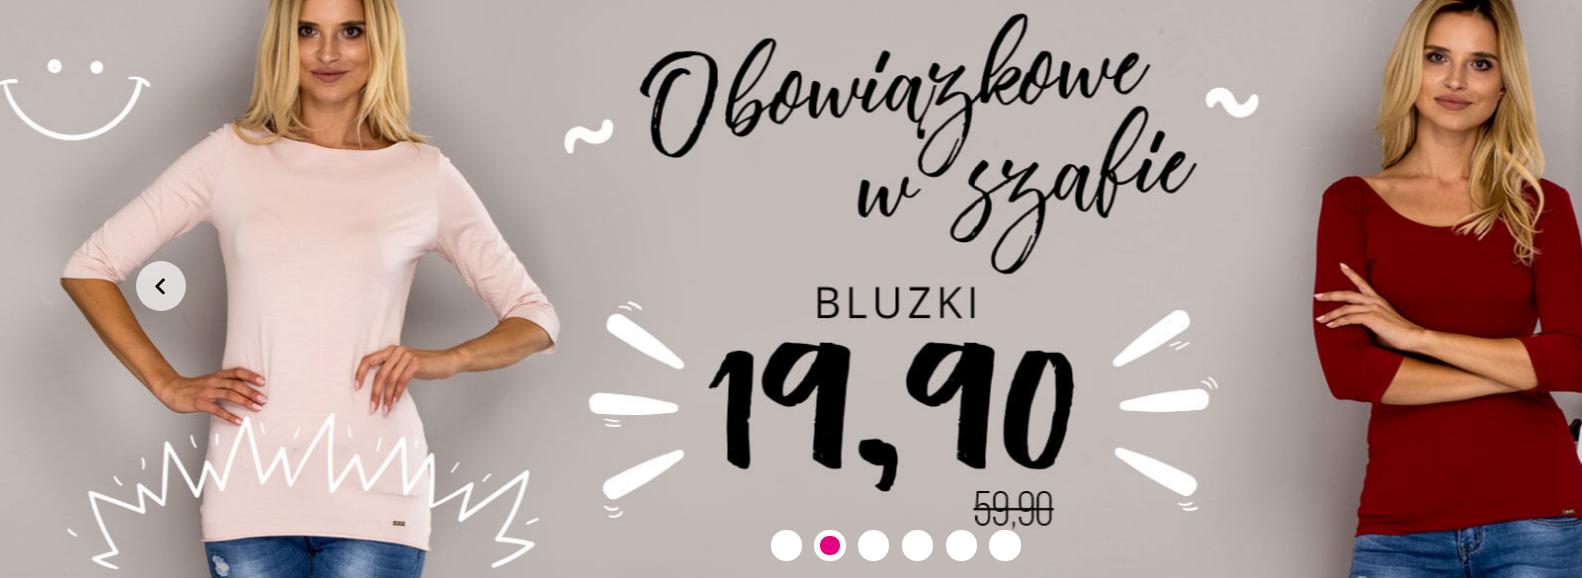 Butik: bluzki za 19,90 zł